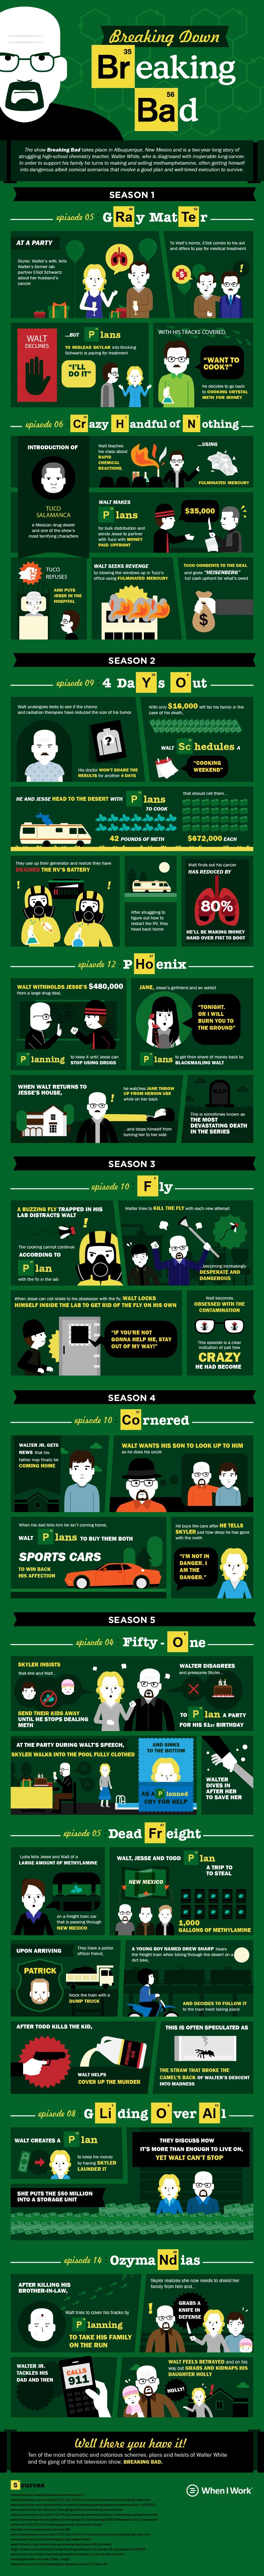 Breaking Down Breaking Bad Infographic